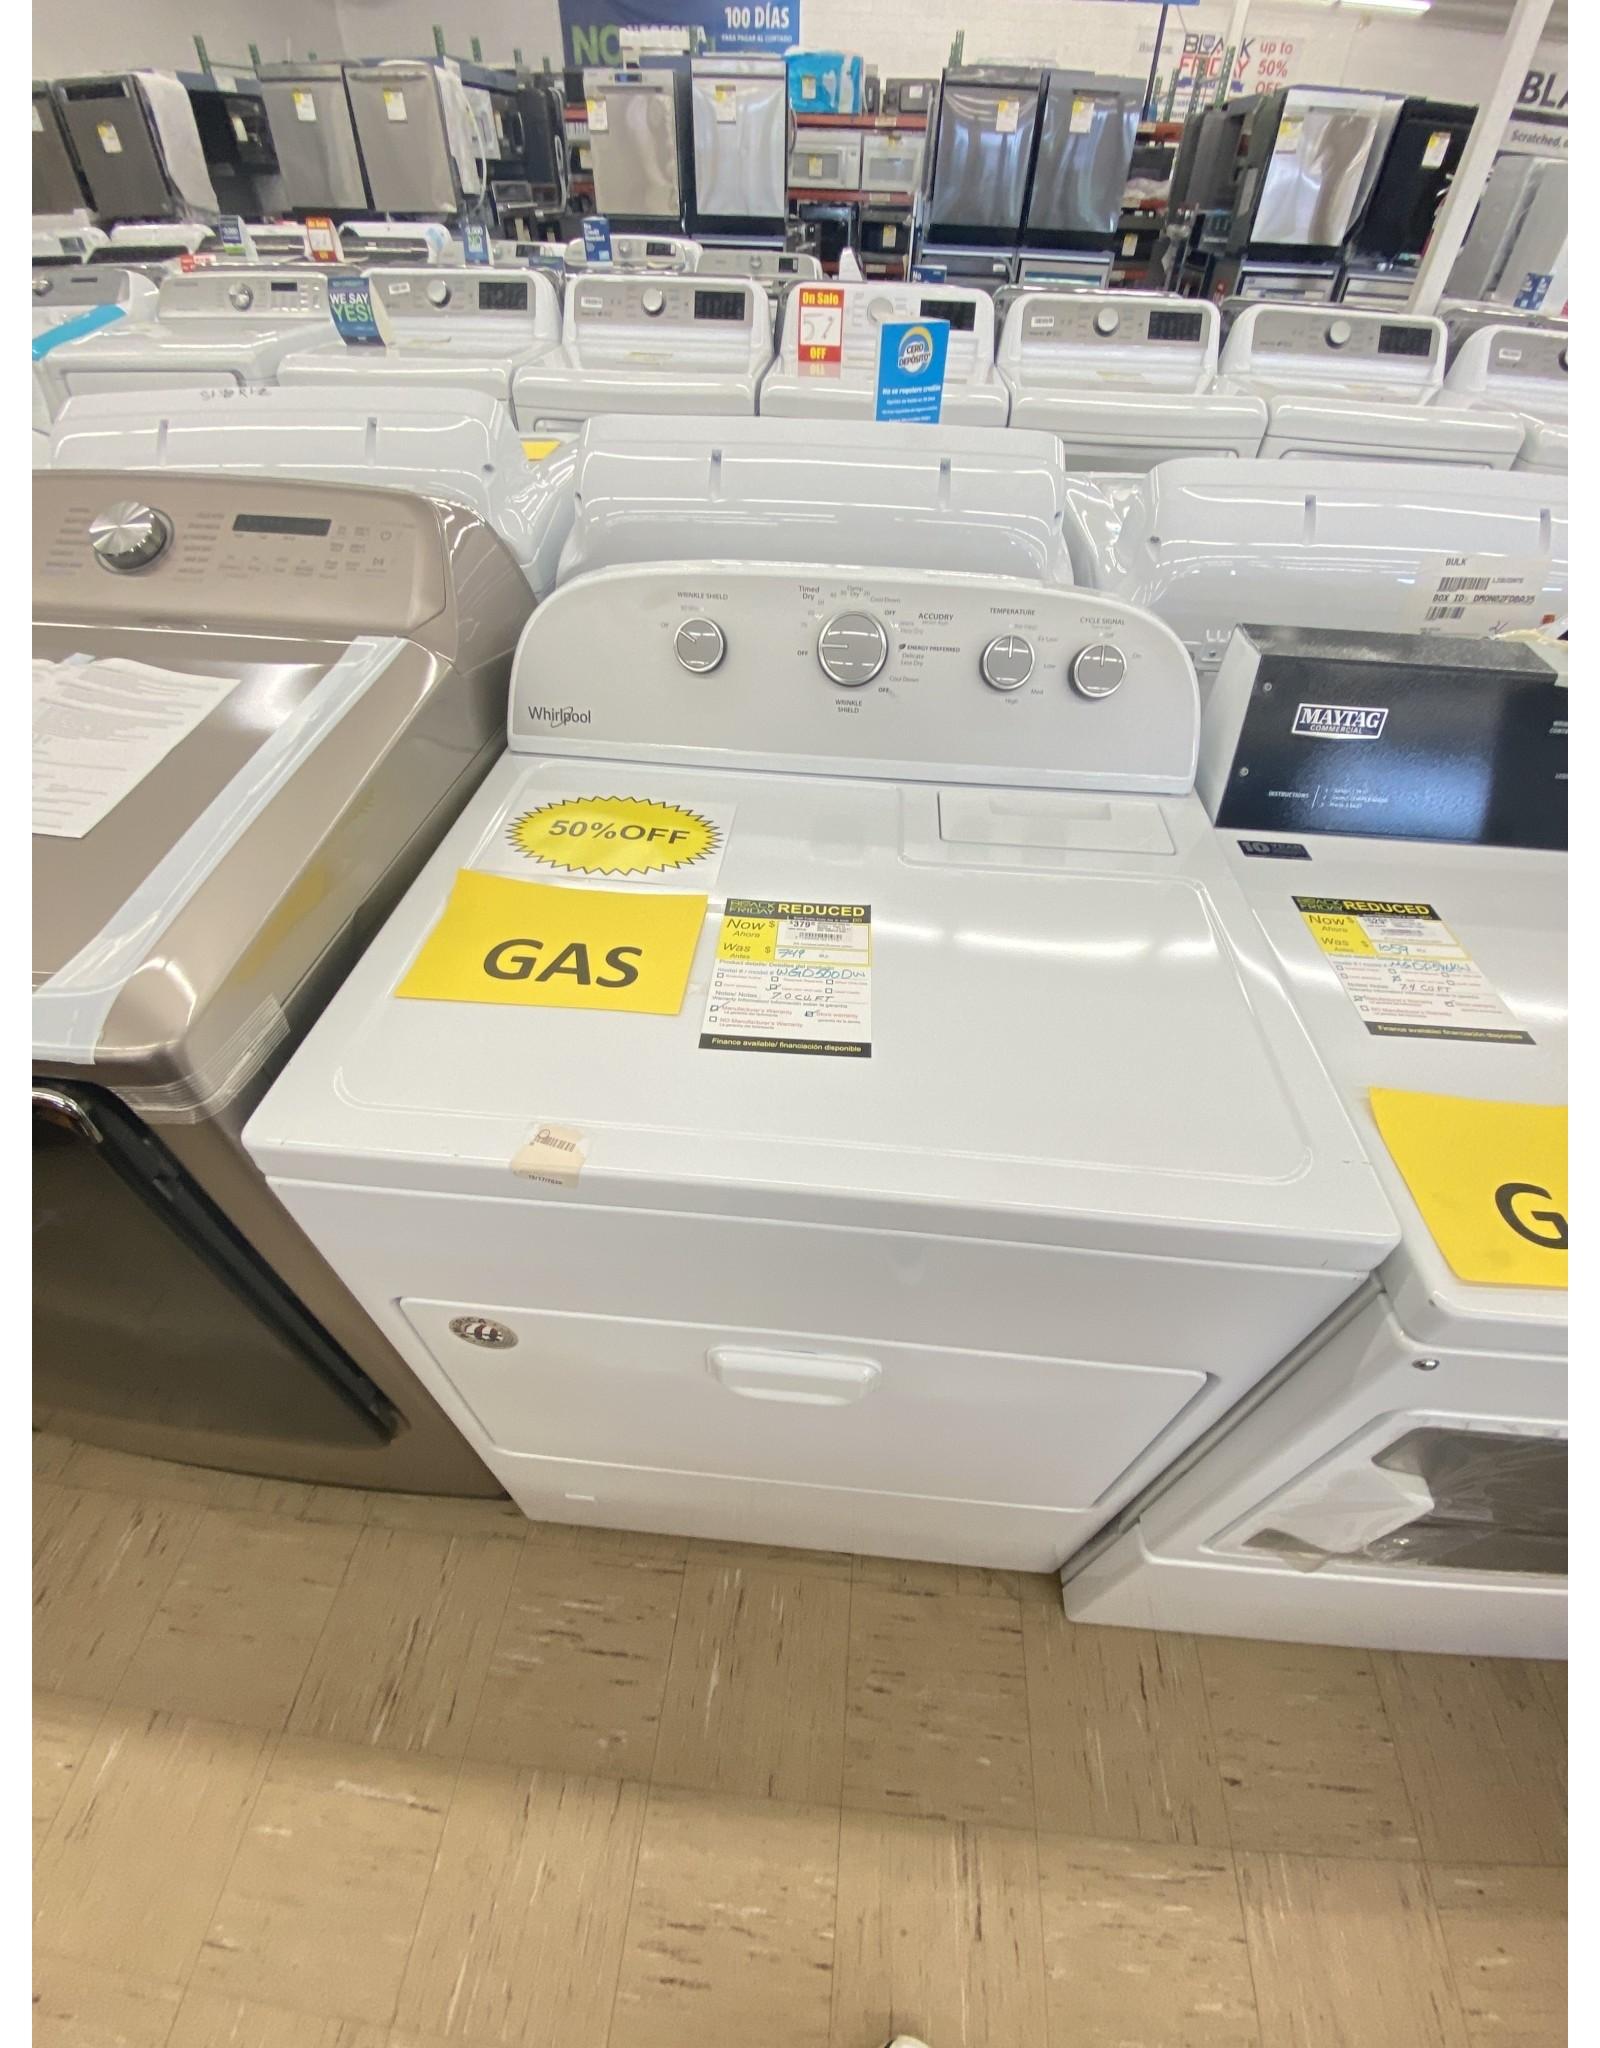 WGD5000DW WHR Air Vented - Dryer TL Matching - 7.0 CU FT, GAS, HAMPER DOOR, HE SENSOR D